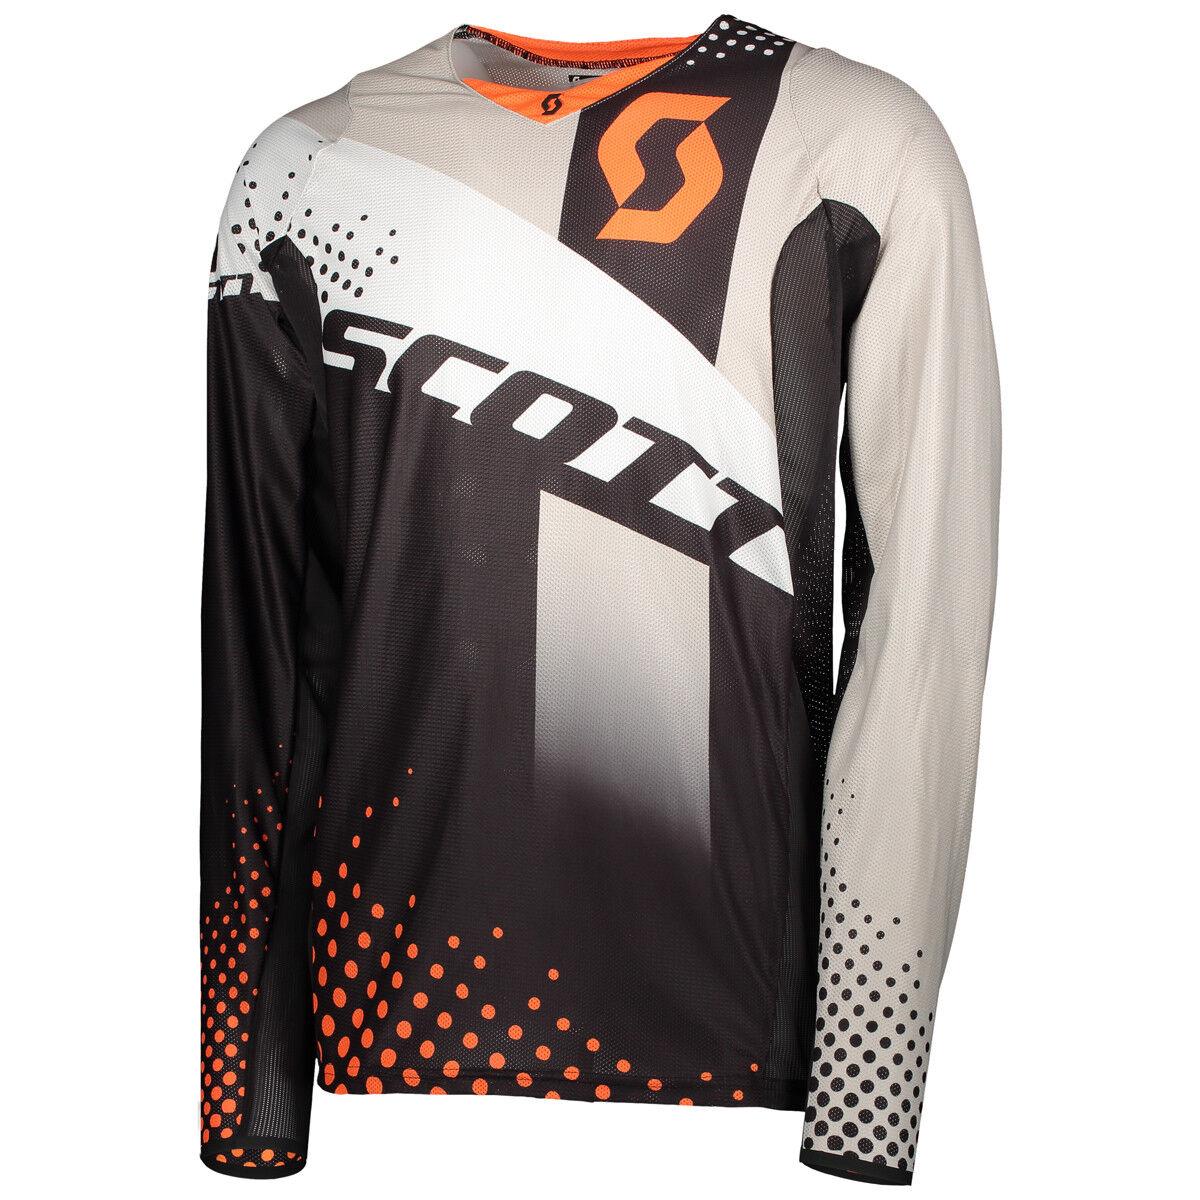 Scott 450 Angled MX Motocross Jersey / DH Fahrrad 2018 Trikot schwarz/Orange 2018 Fahrrad 61645b